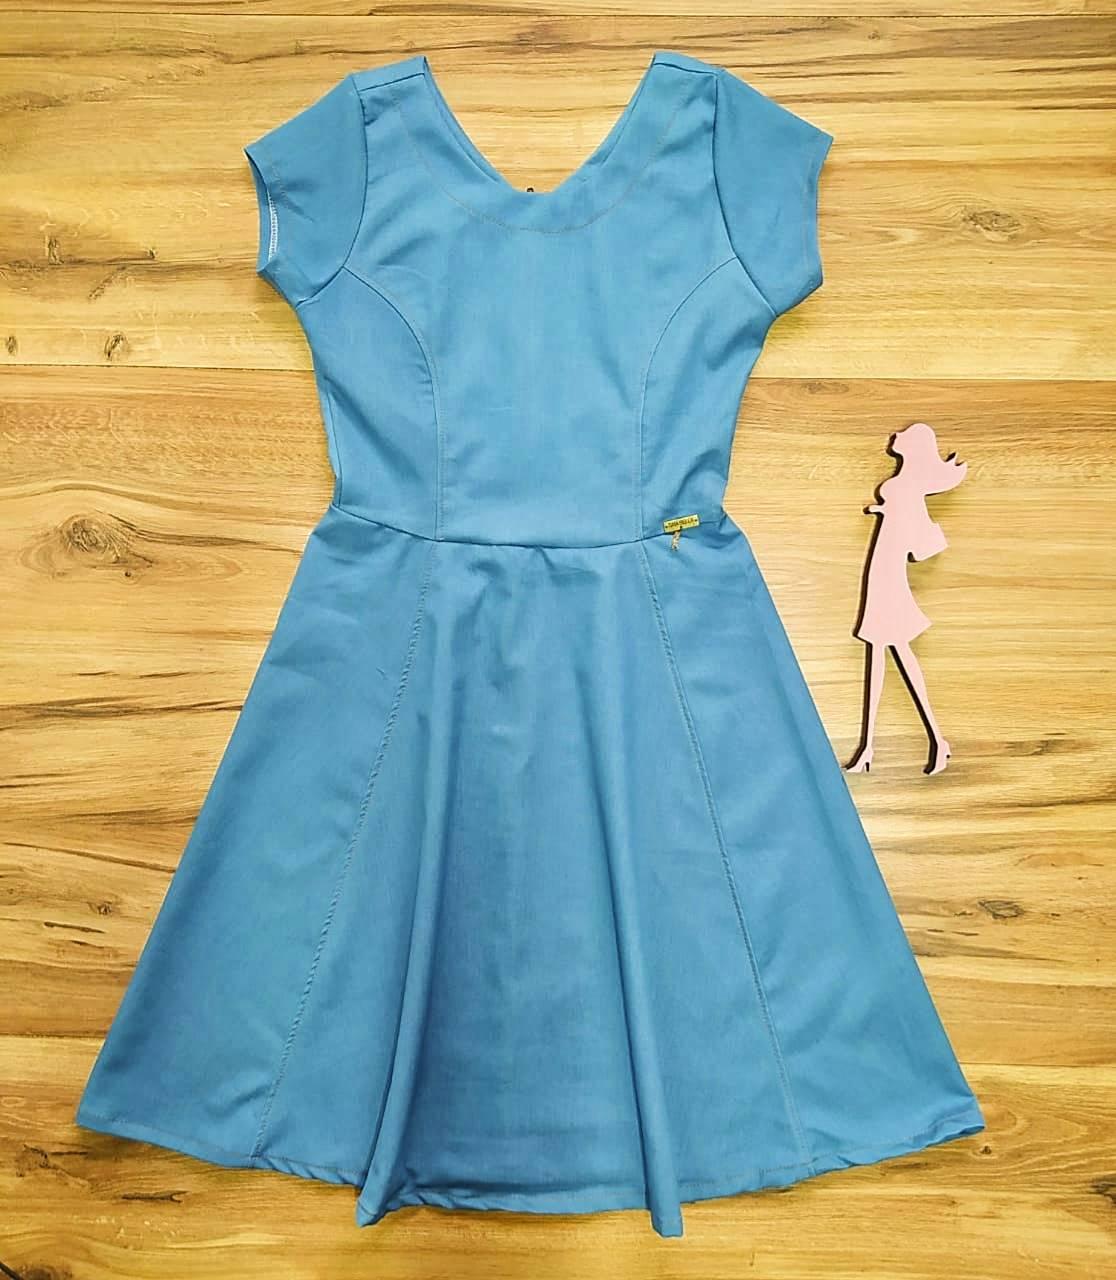 Vestido Julietta Saia Bella SB97501 - Azul claro